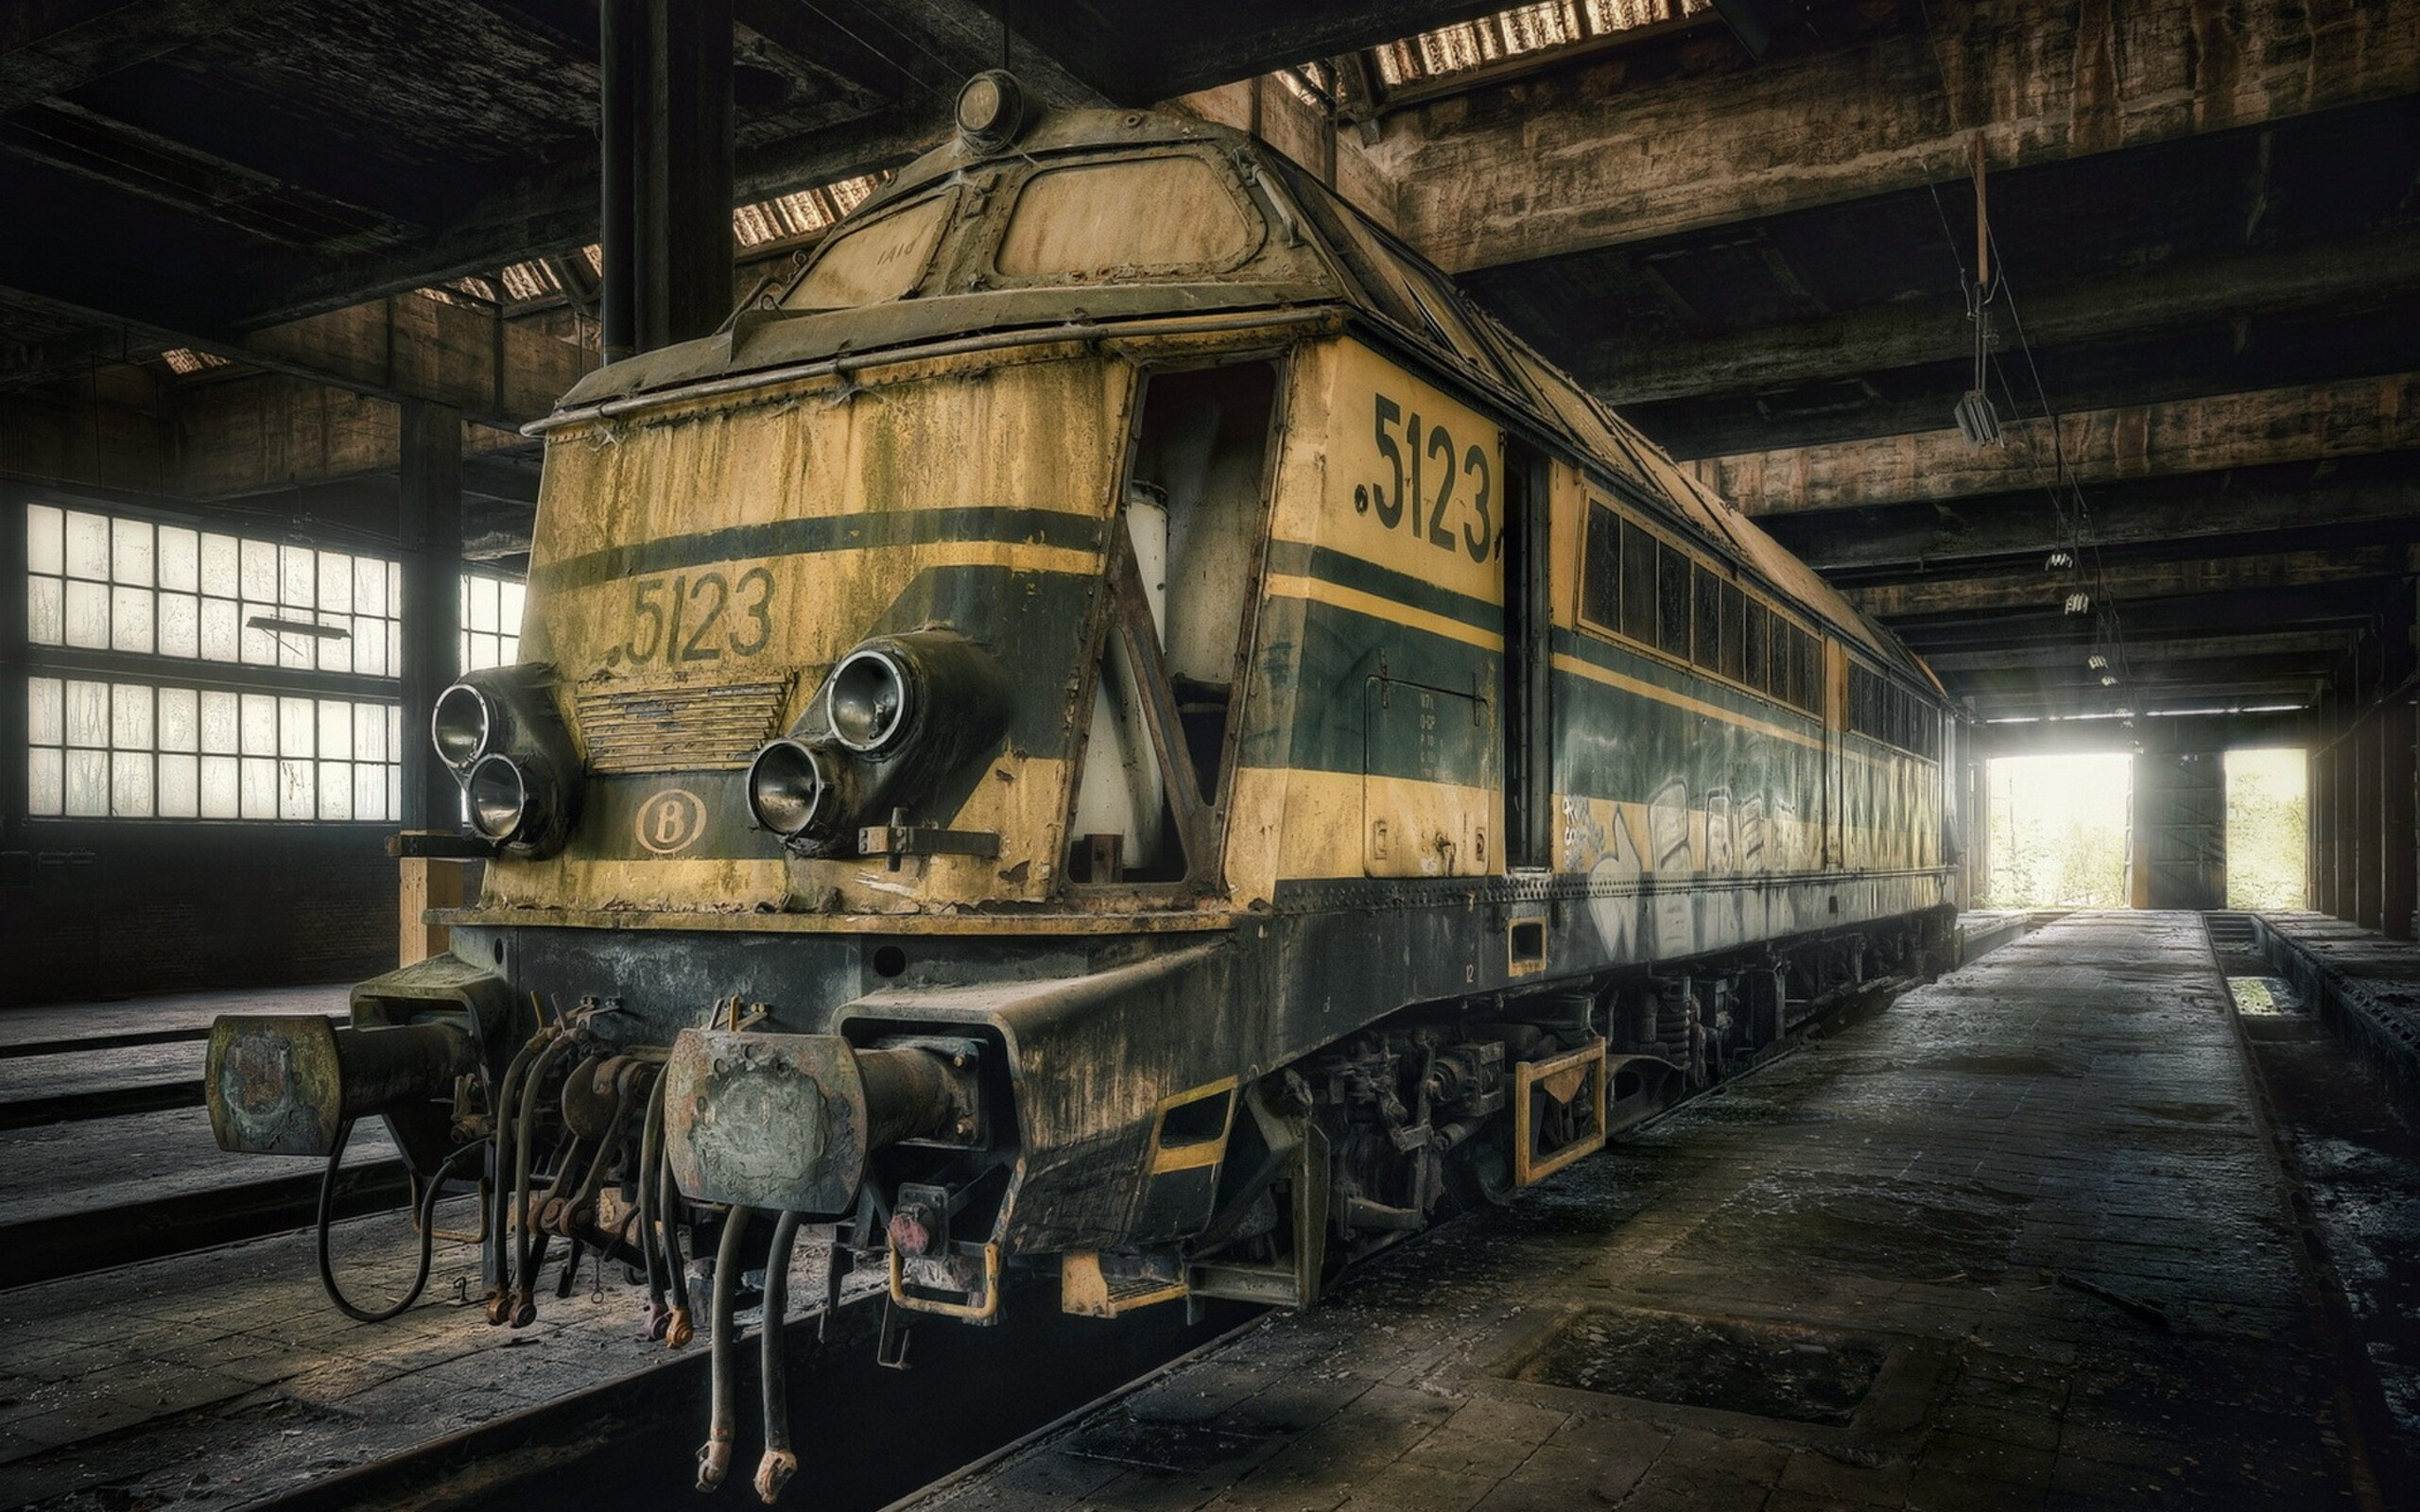 2560x1600 Dusty Old Train Art 2560x1600 Resolution Hd 4k